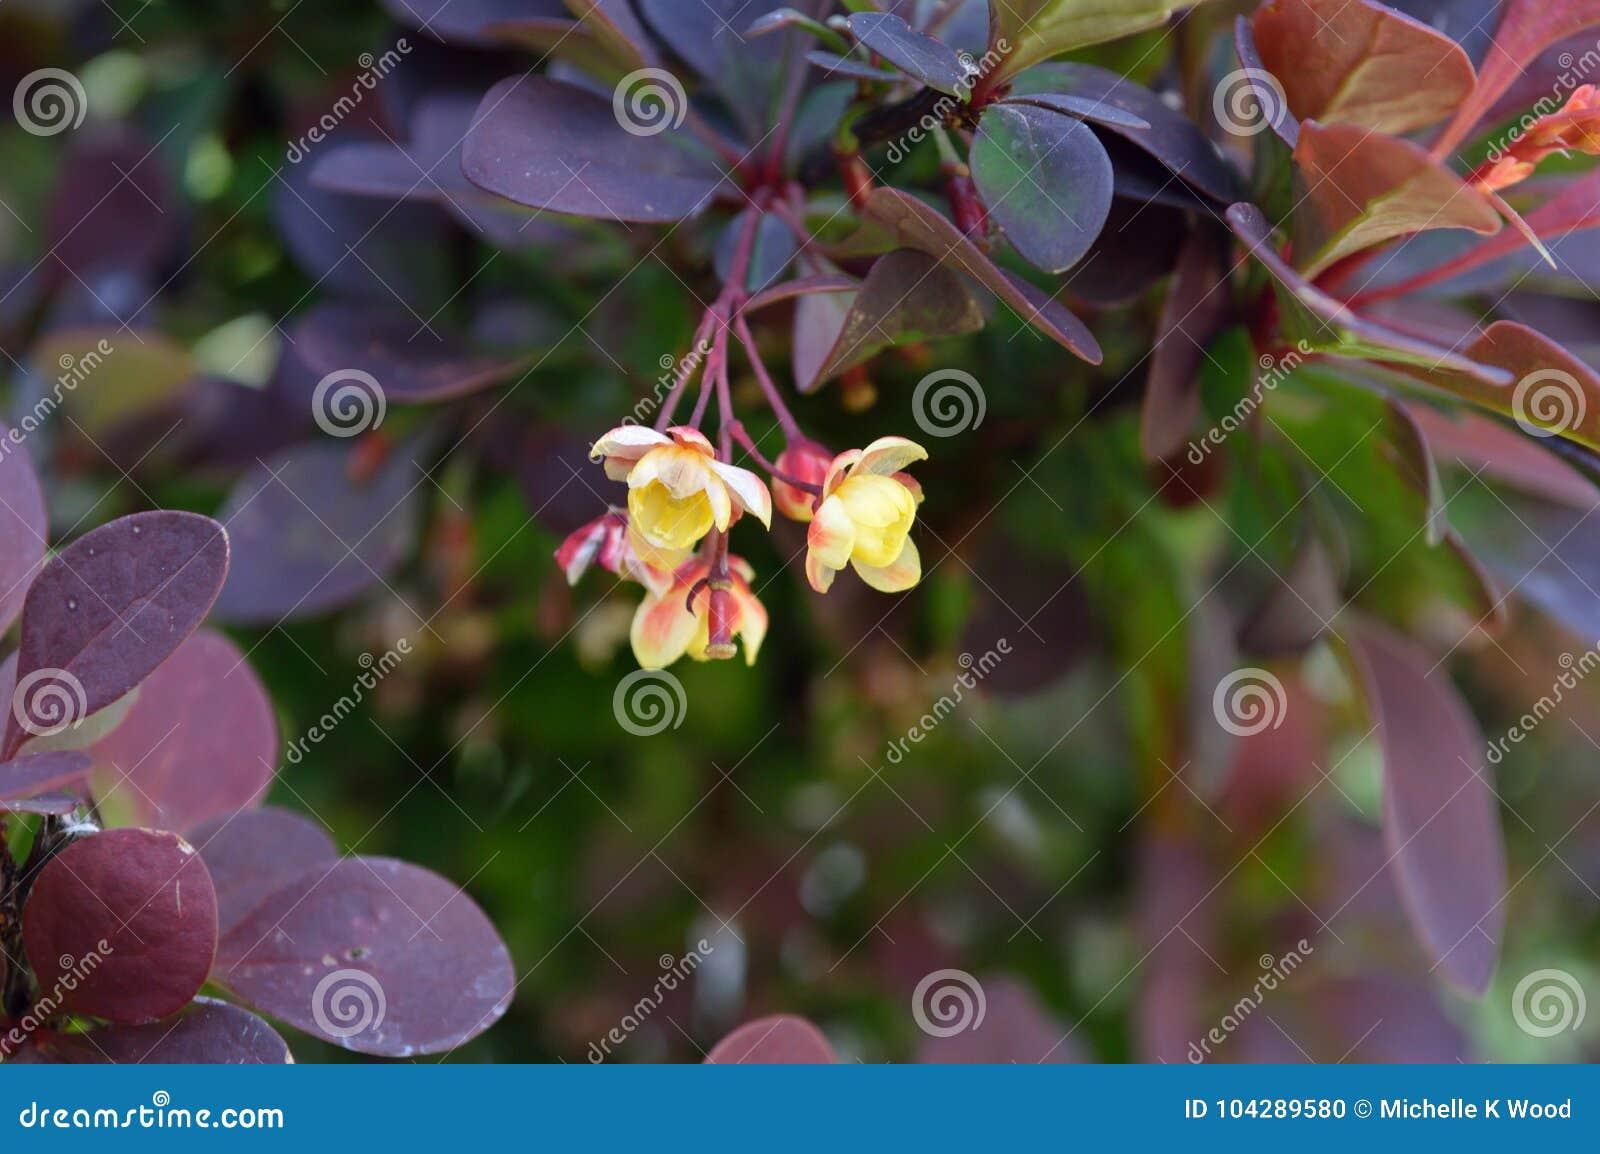 Berberis thunbergii flower cluster closeup